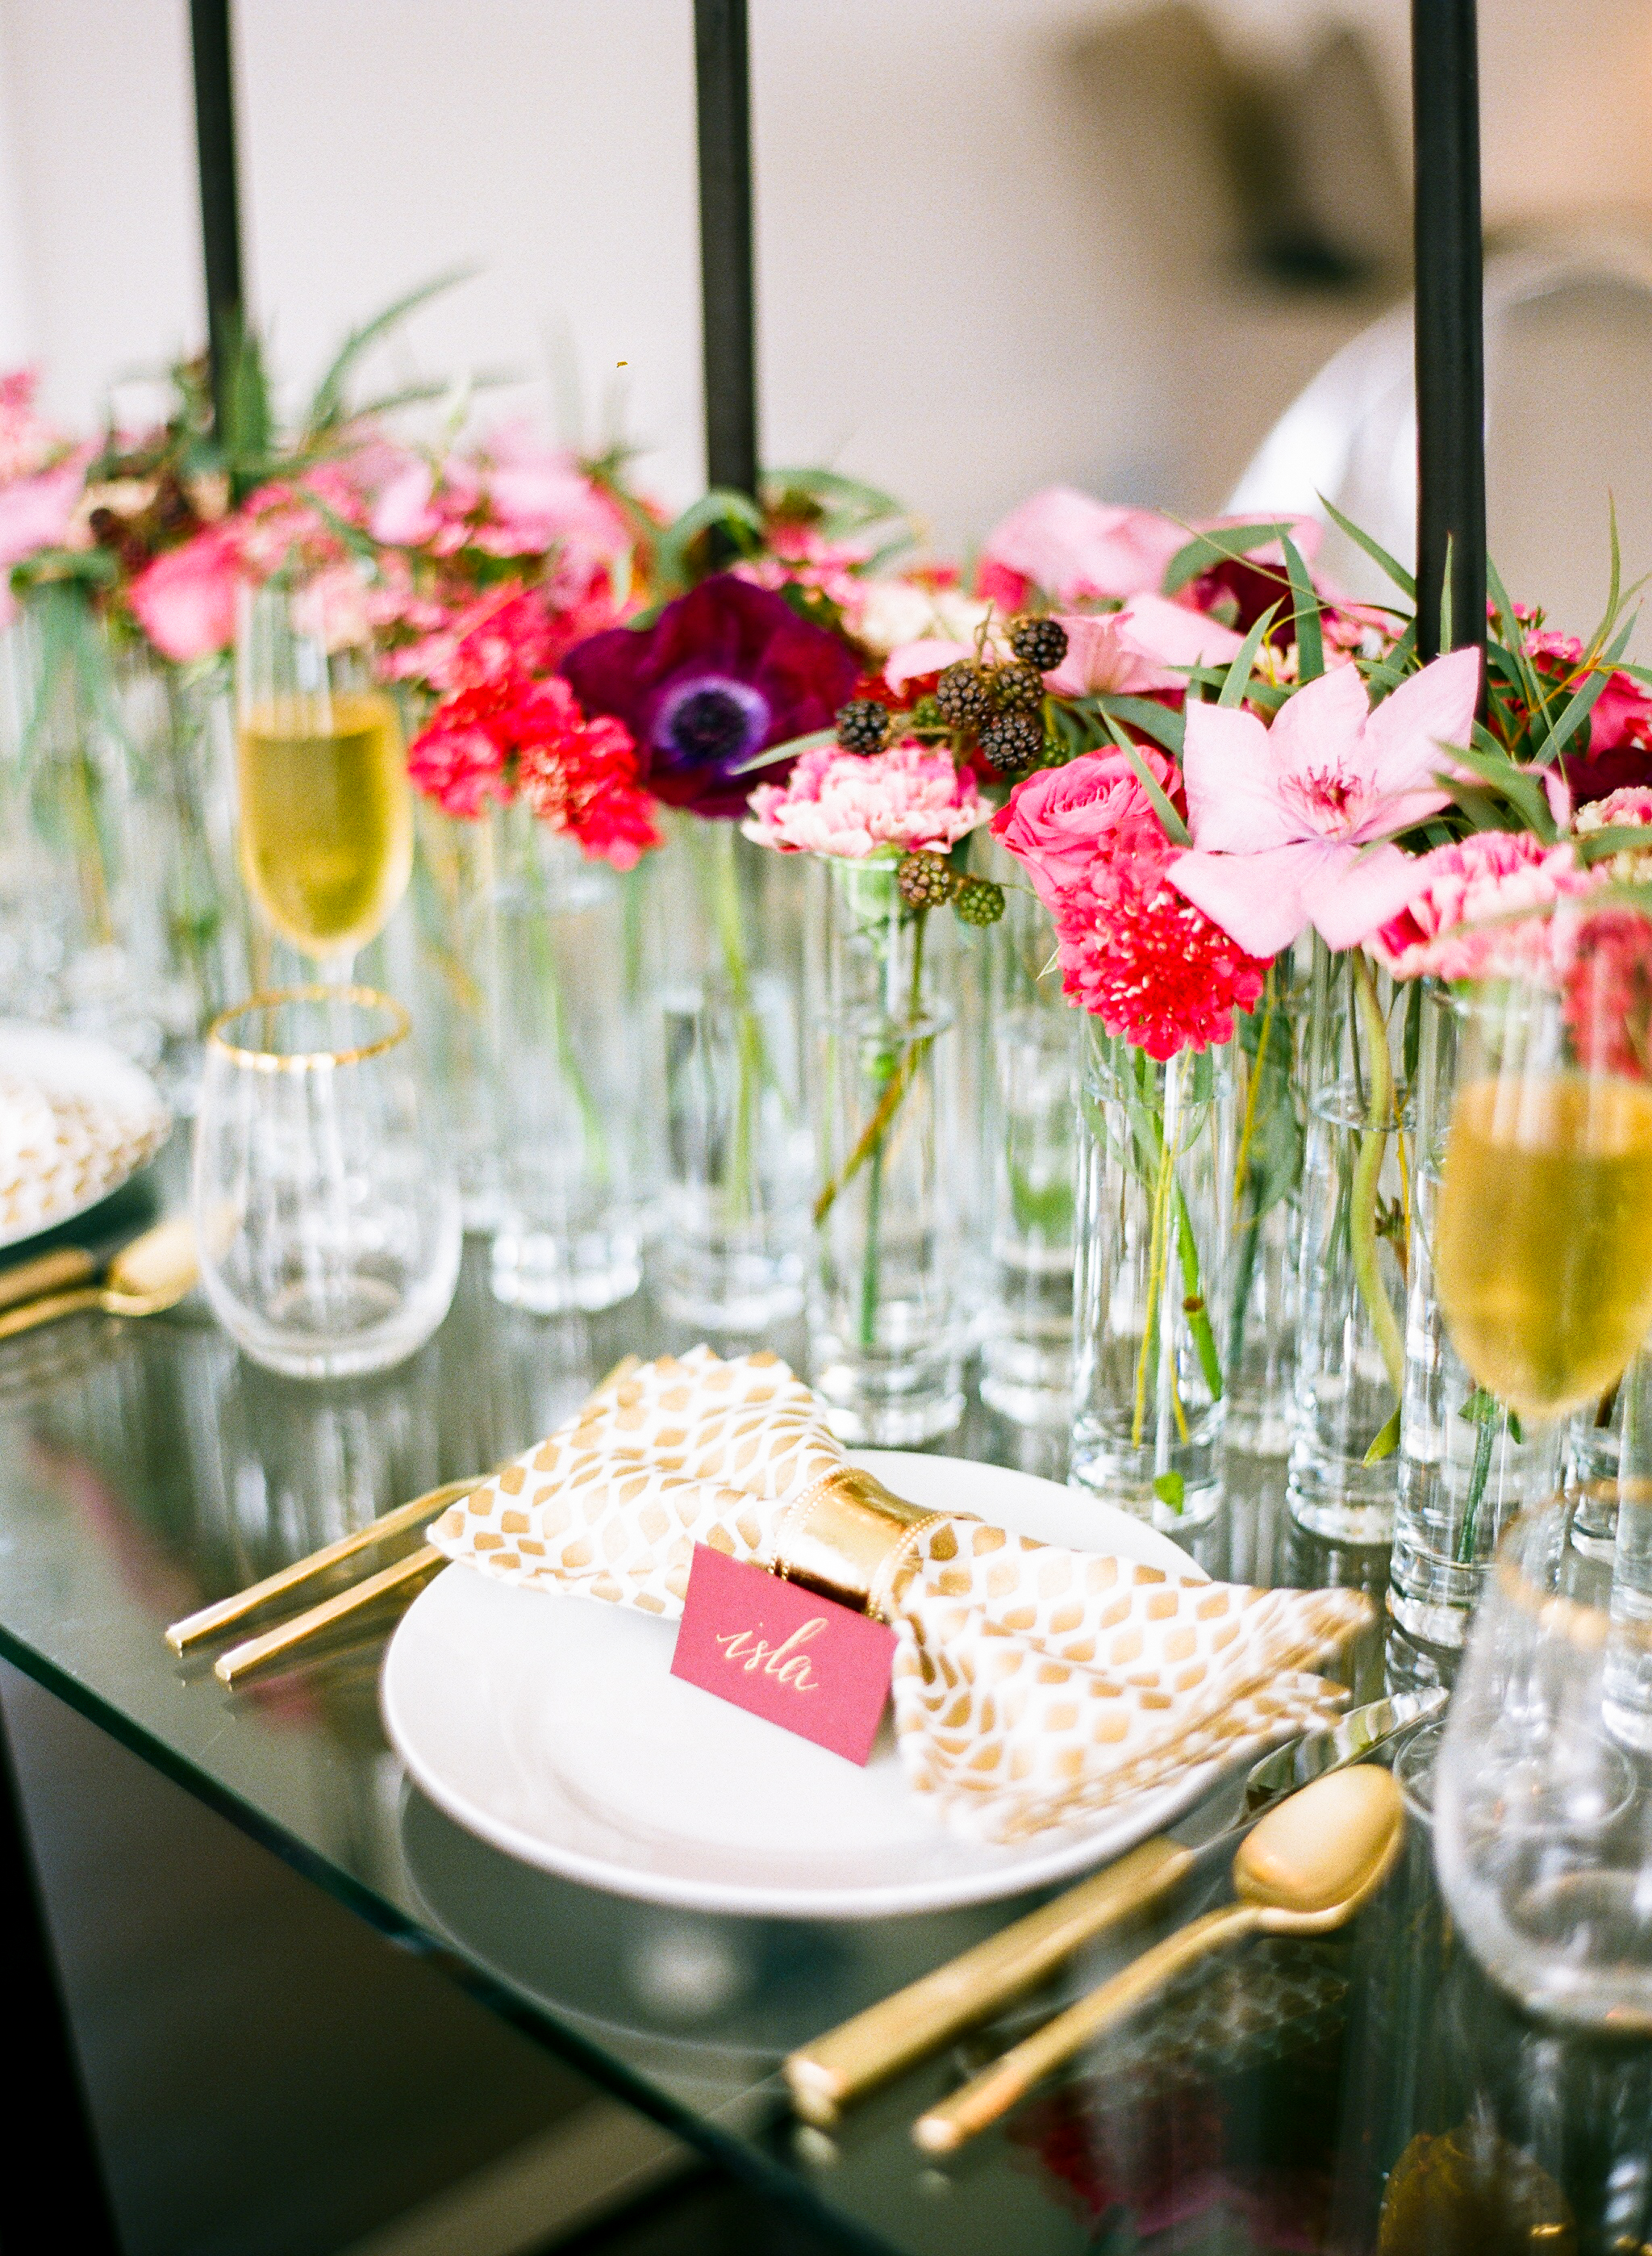 wedding centerpieces with berries